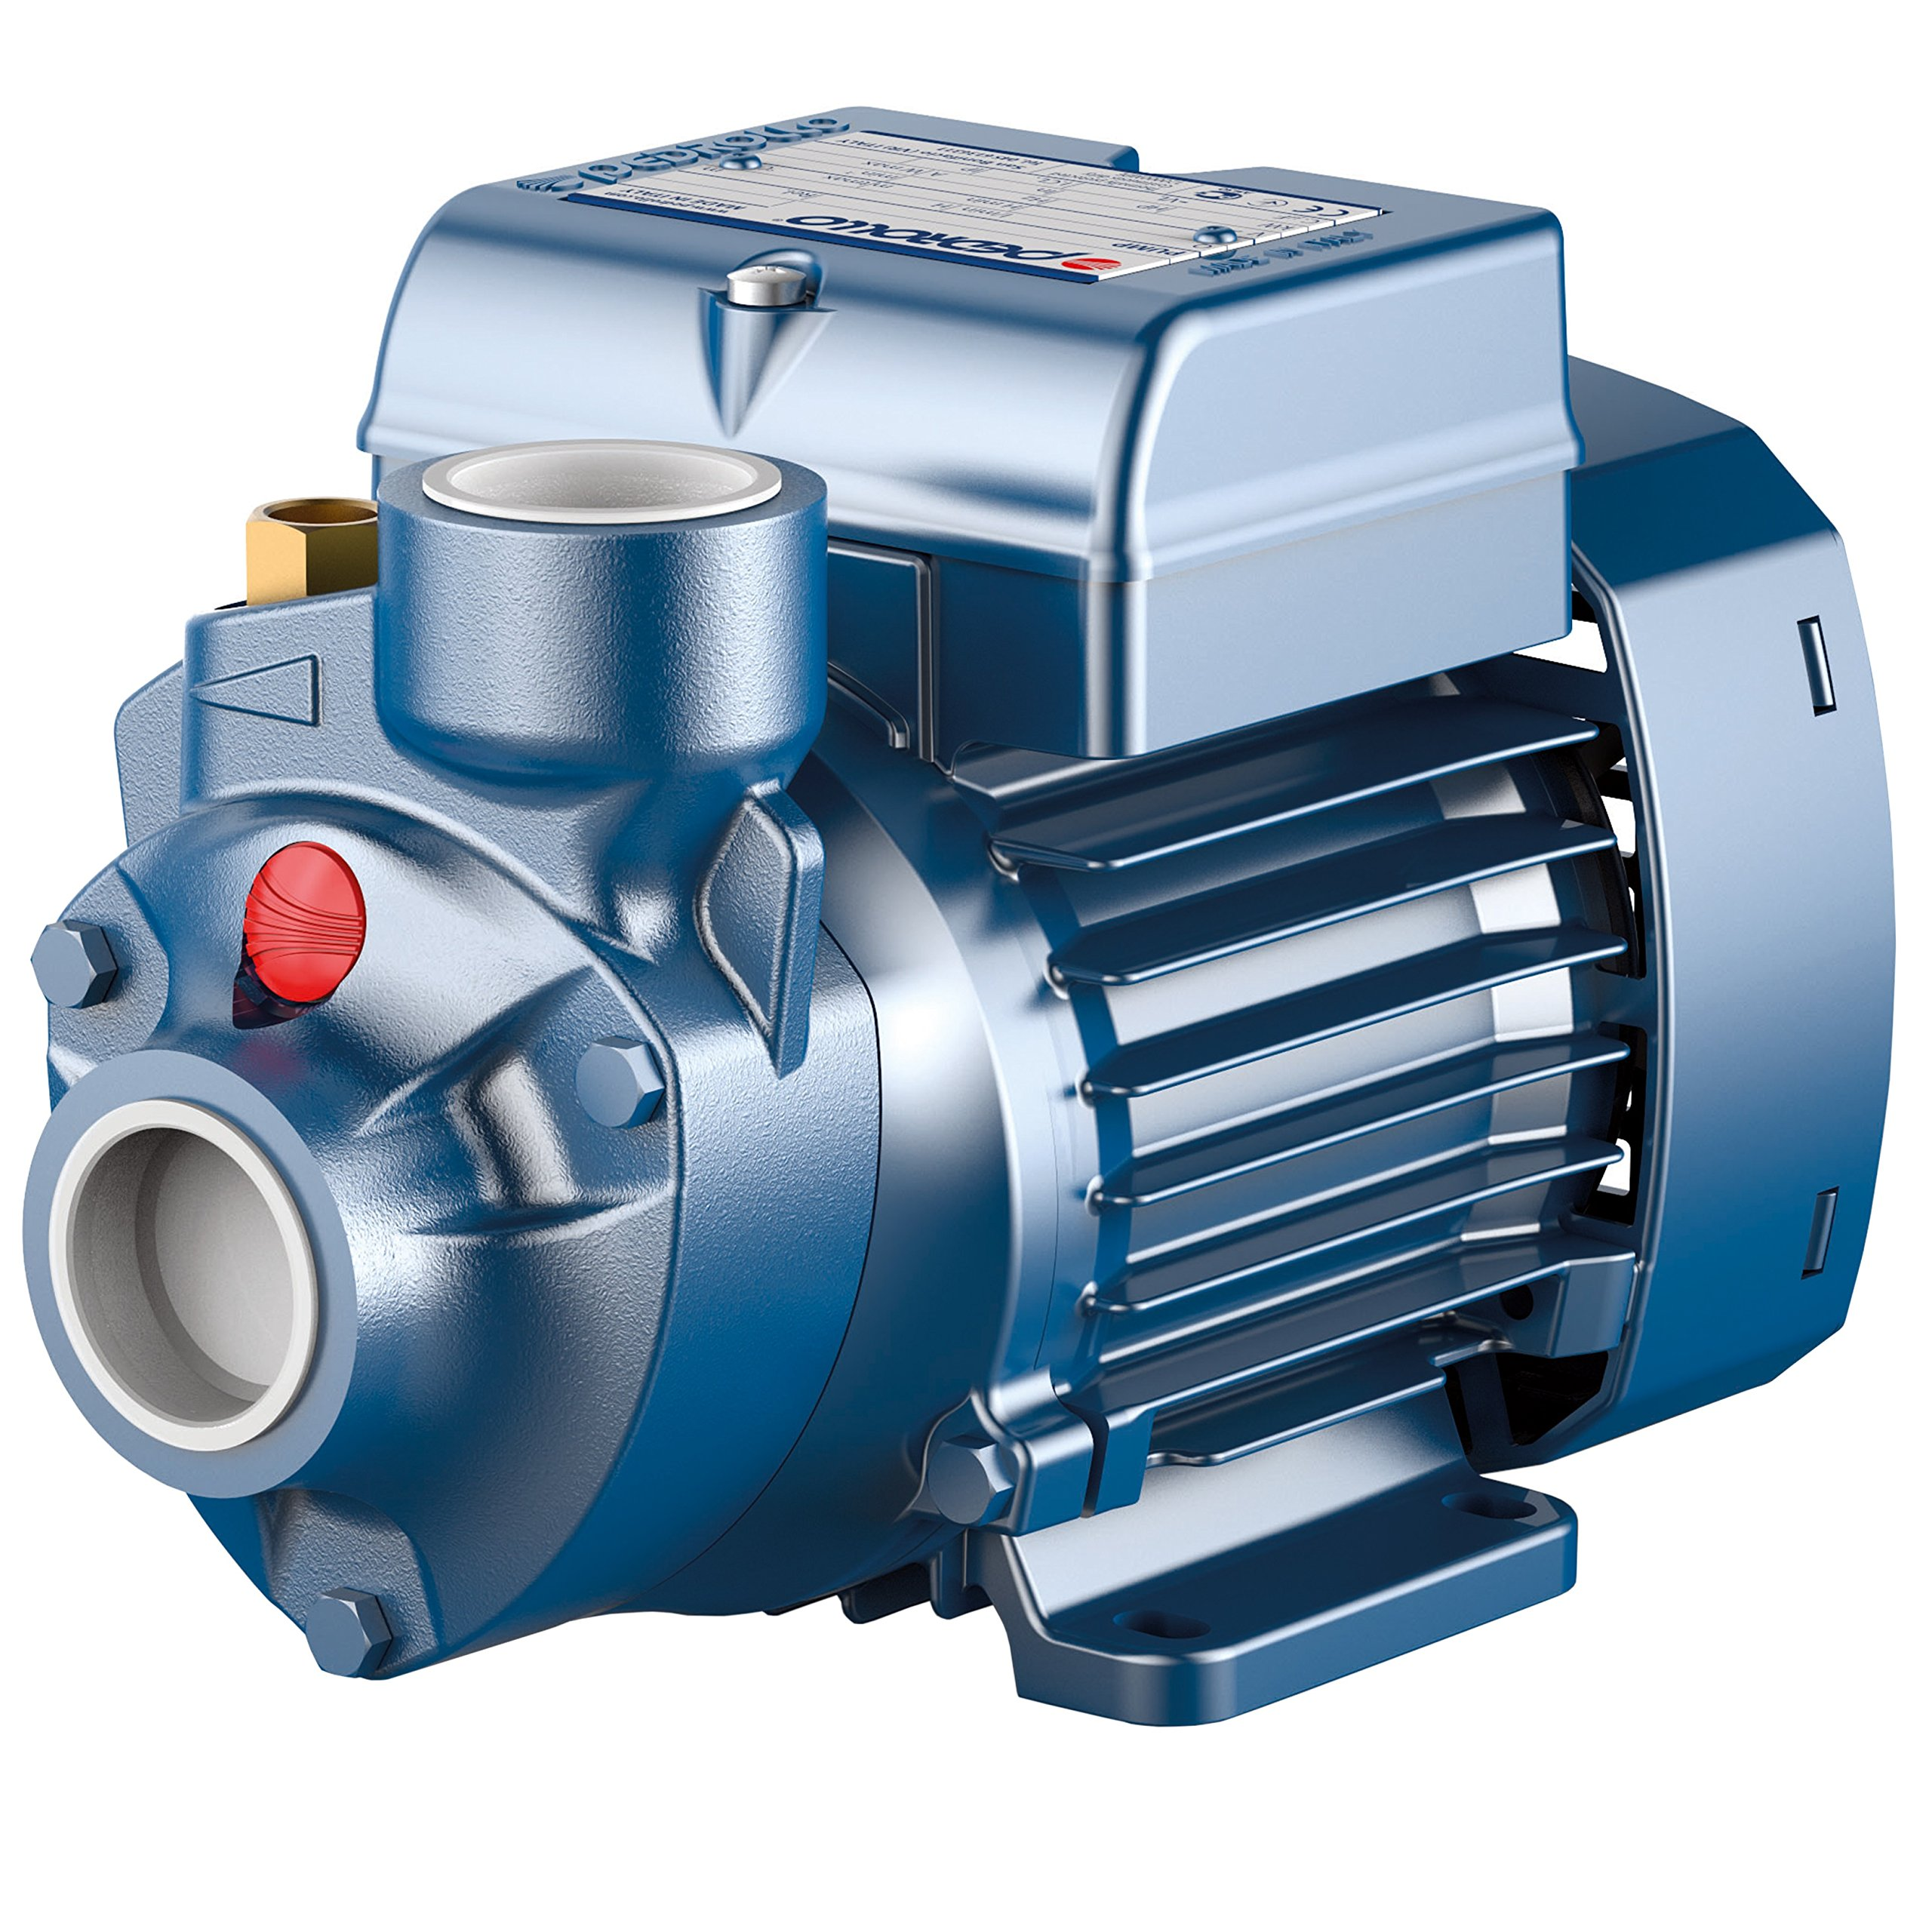 Pedrollo Booster Water Pump — 634 GPH, 1/2 HP, 115 Volts, Model# PKm60 by Pedrollo (Image #3)